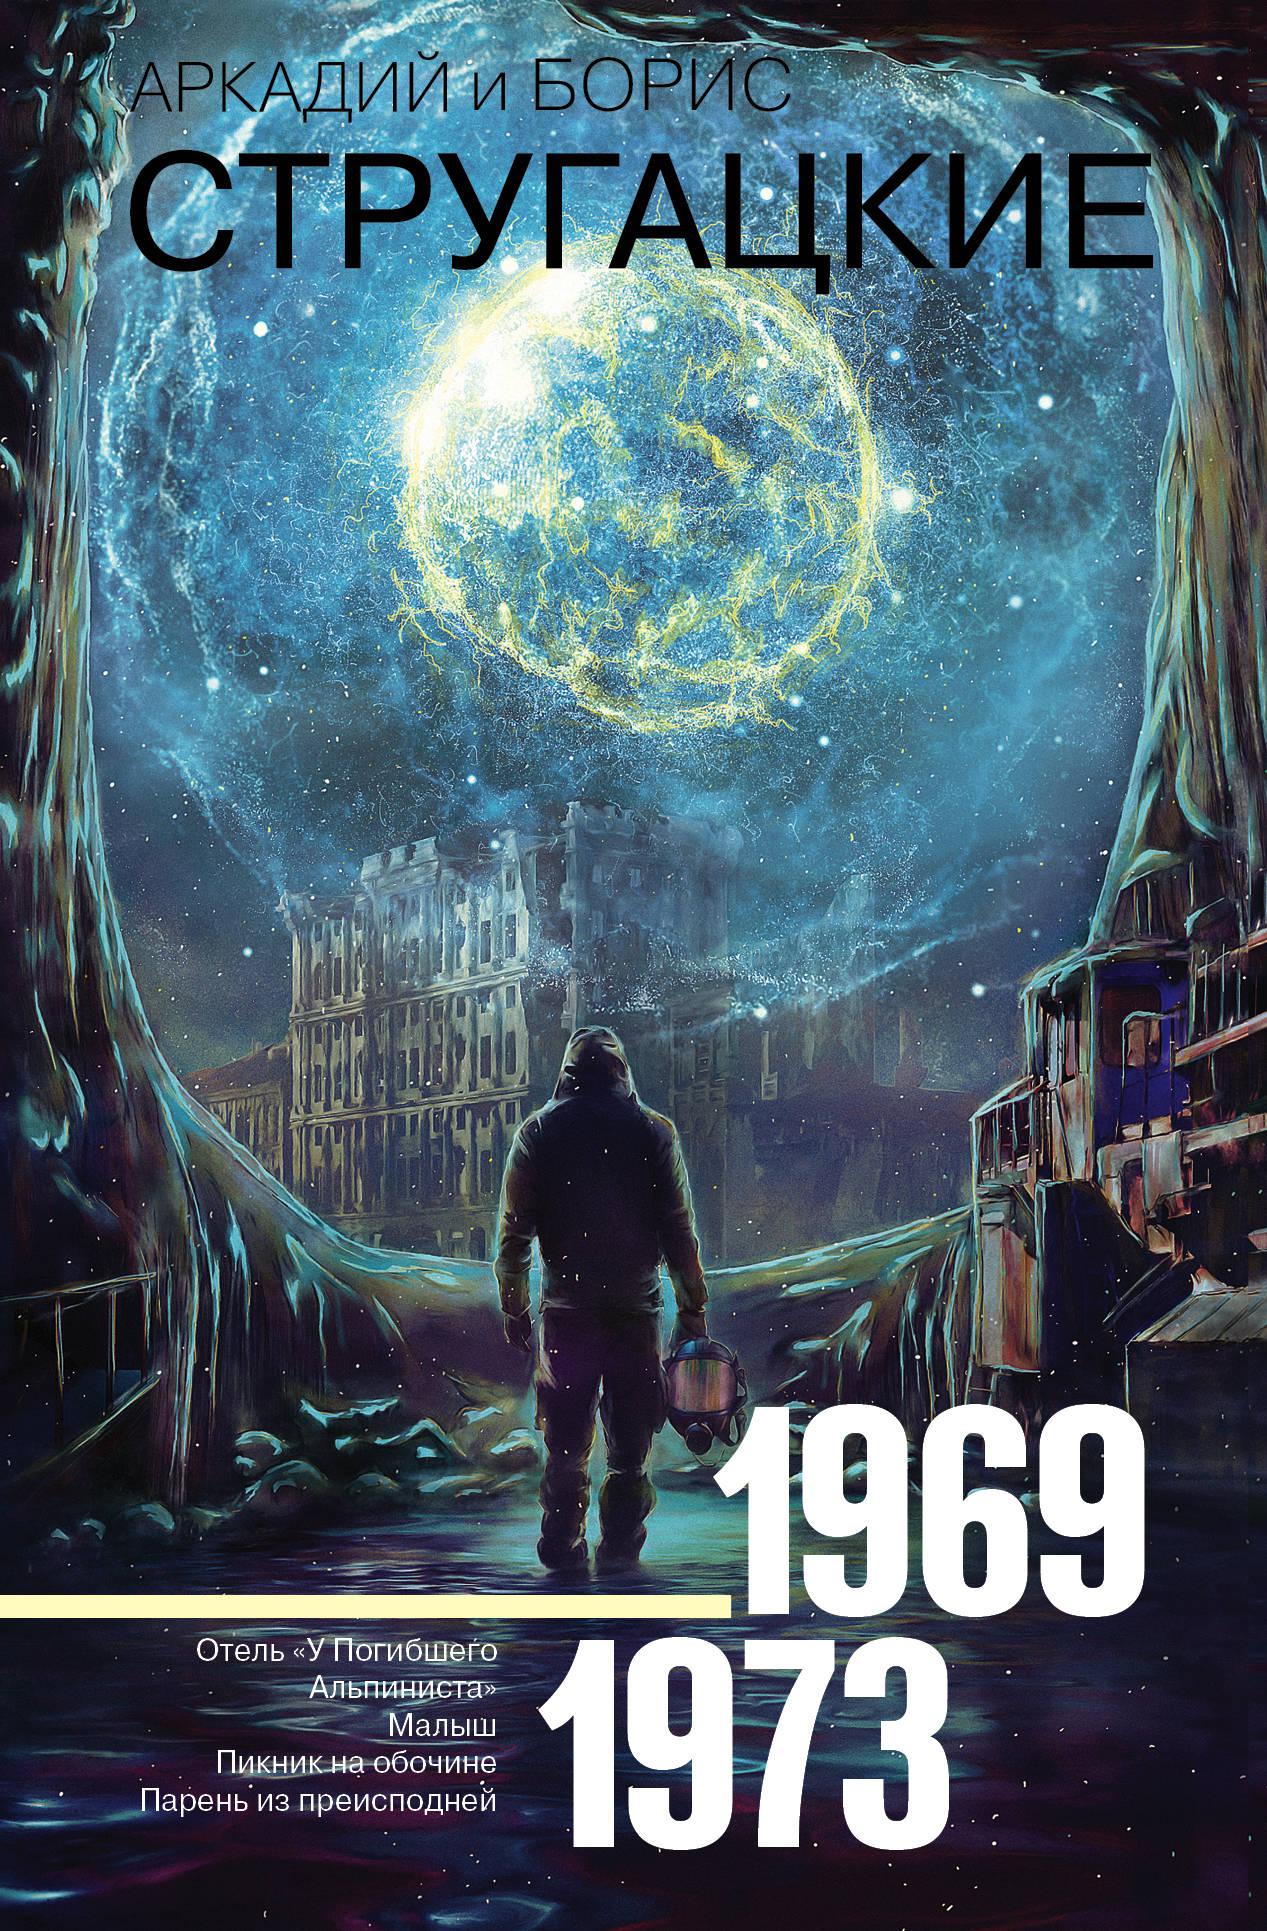 Стругацкий Аркадий; Стругацкий Борис Натанович Собрание сочинений. 1969-1973